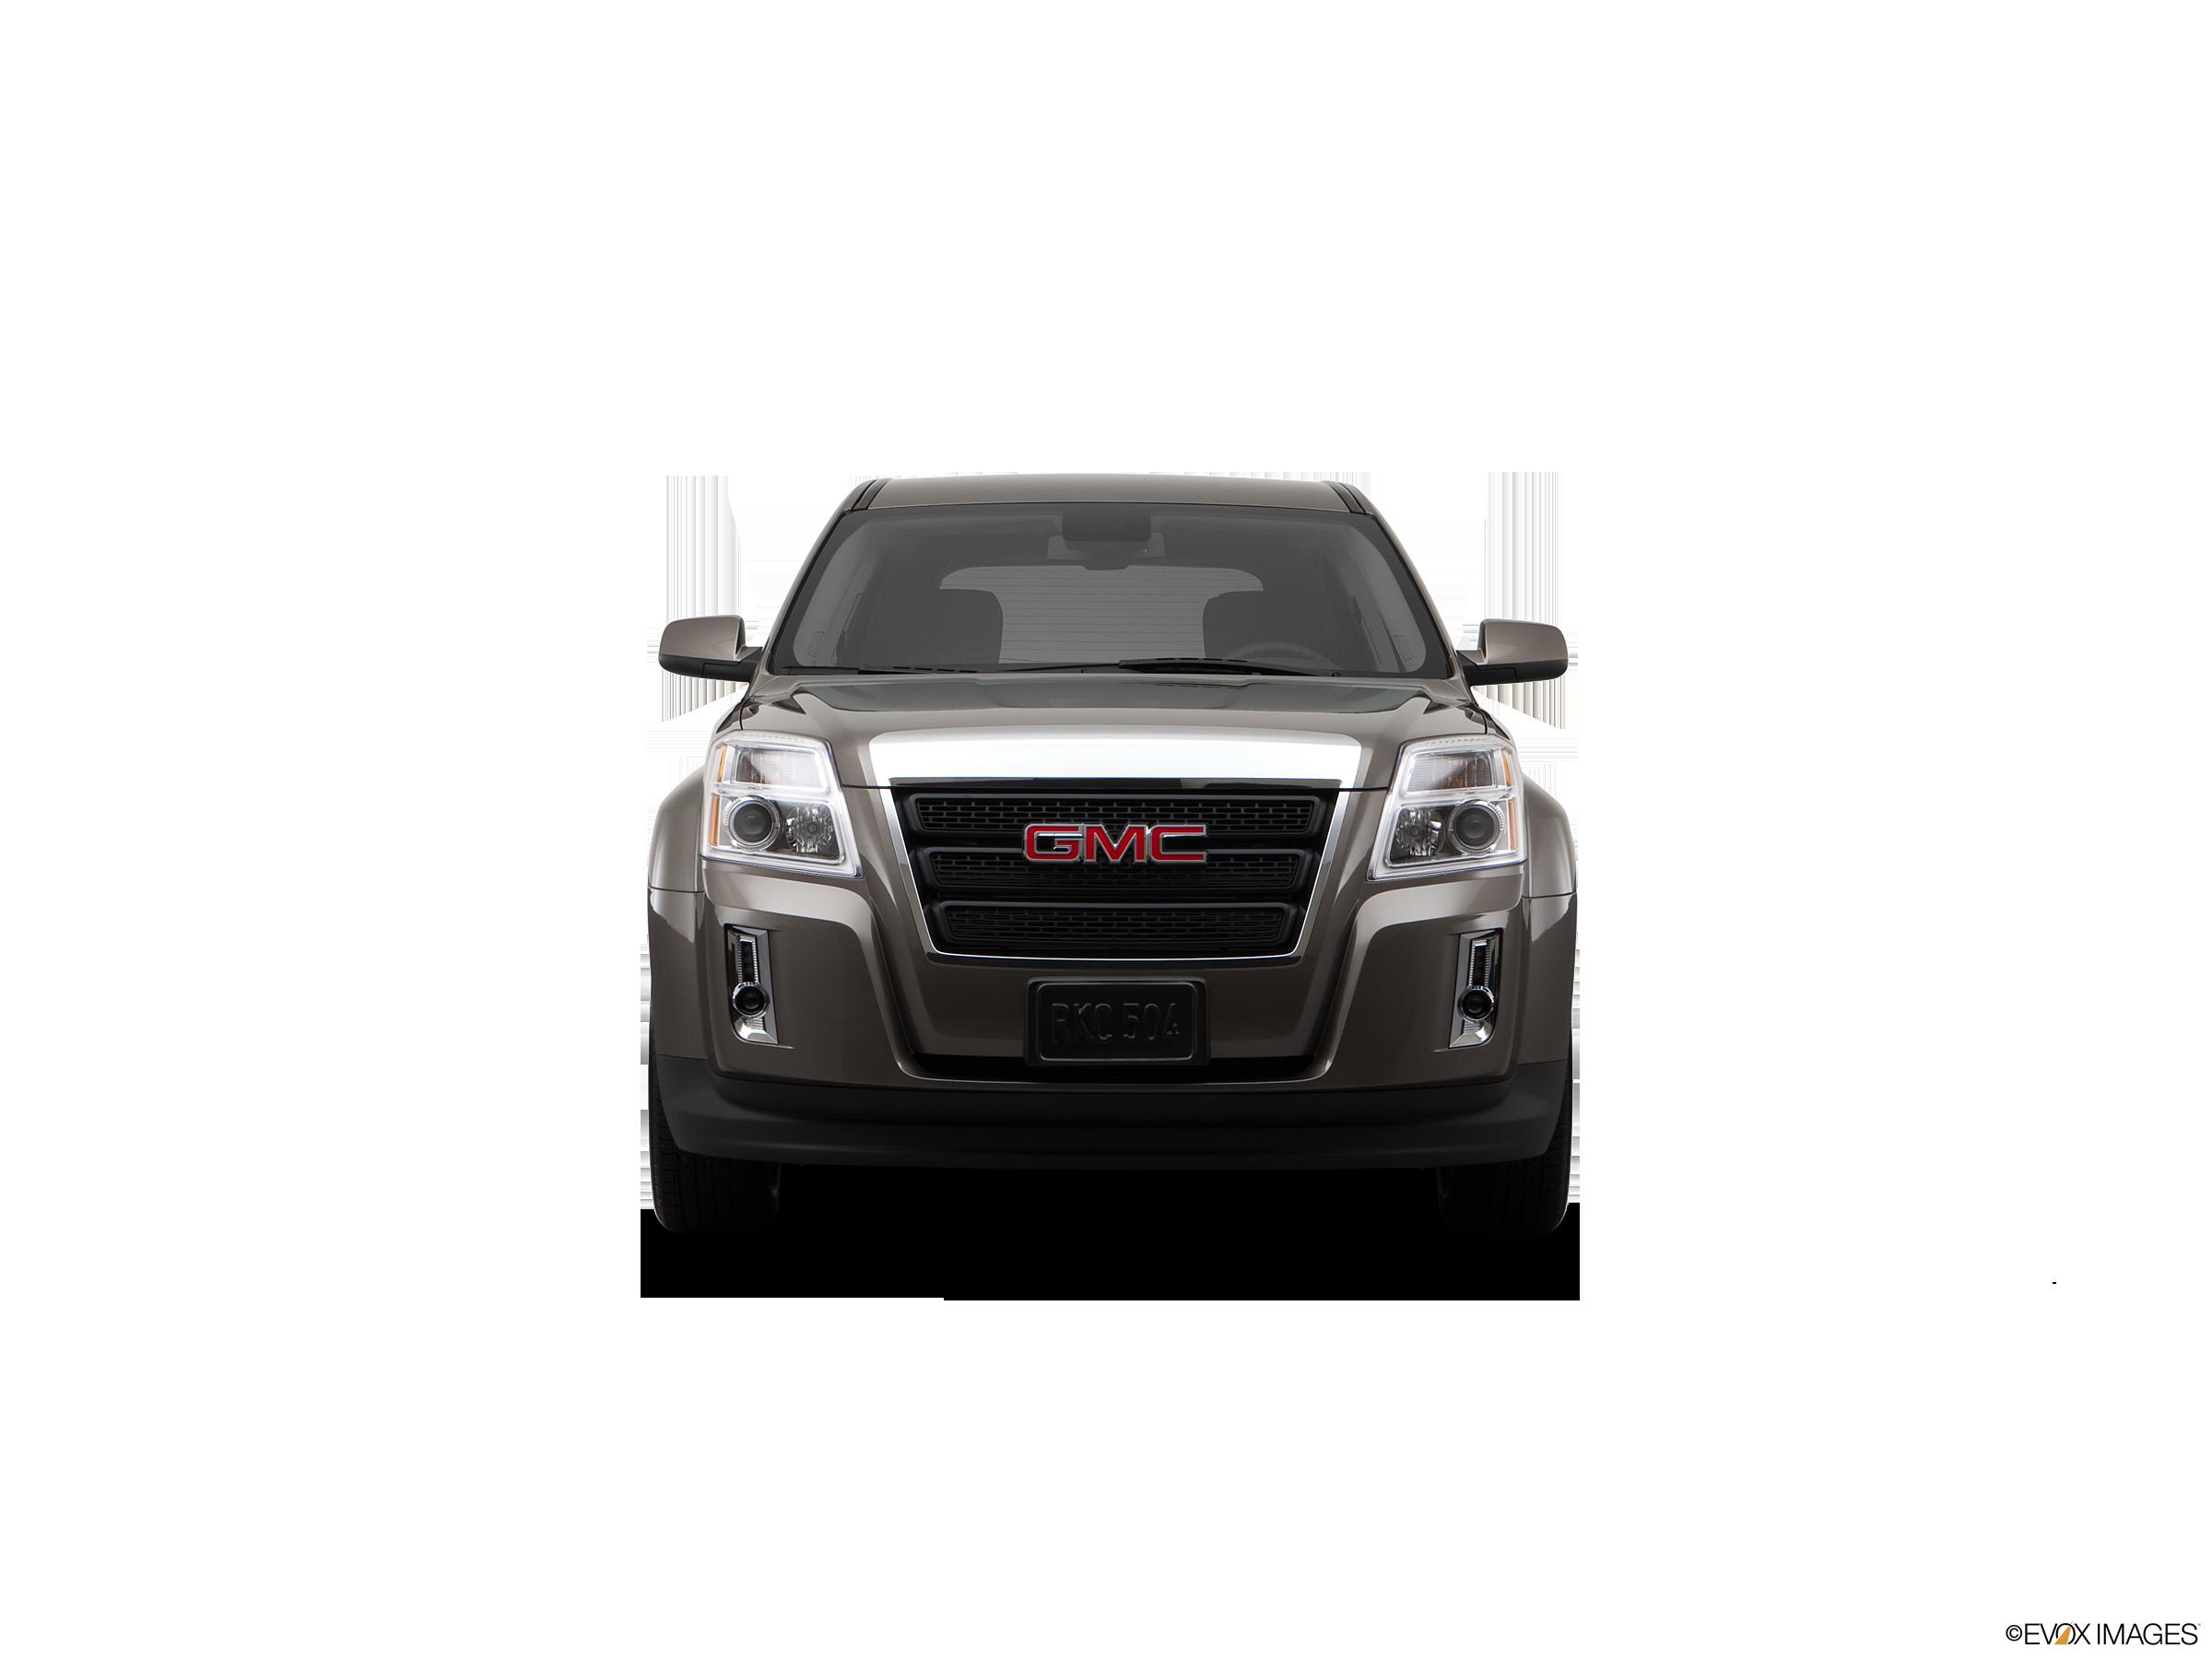 2012 Gmc Terrain Values Cars For Sale Kelley Blue Book